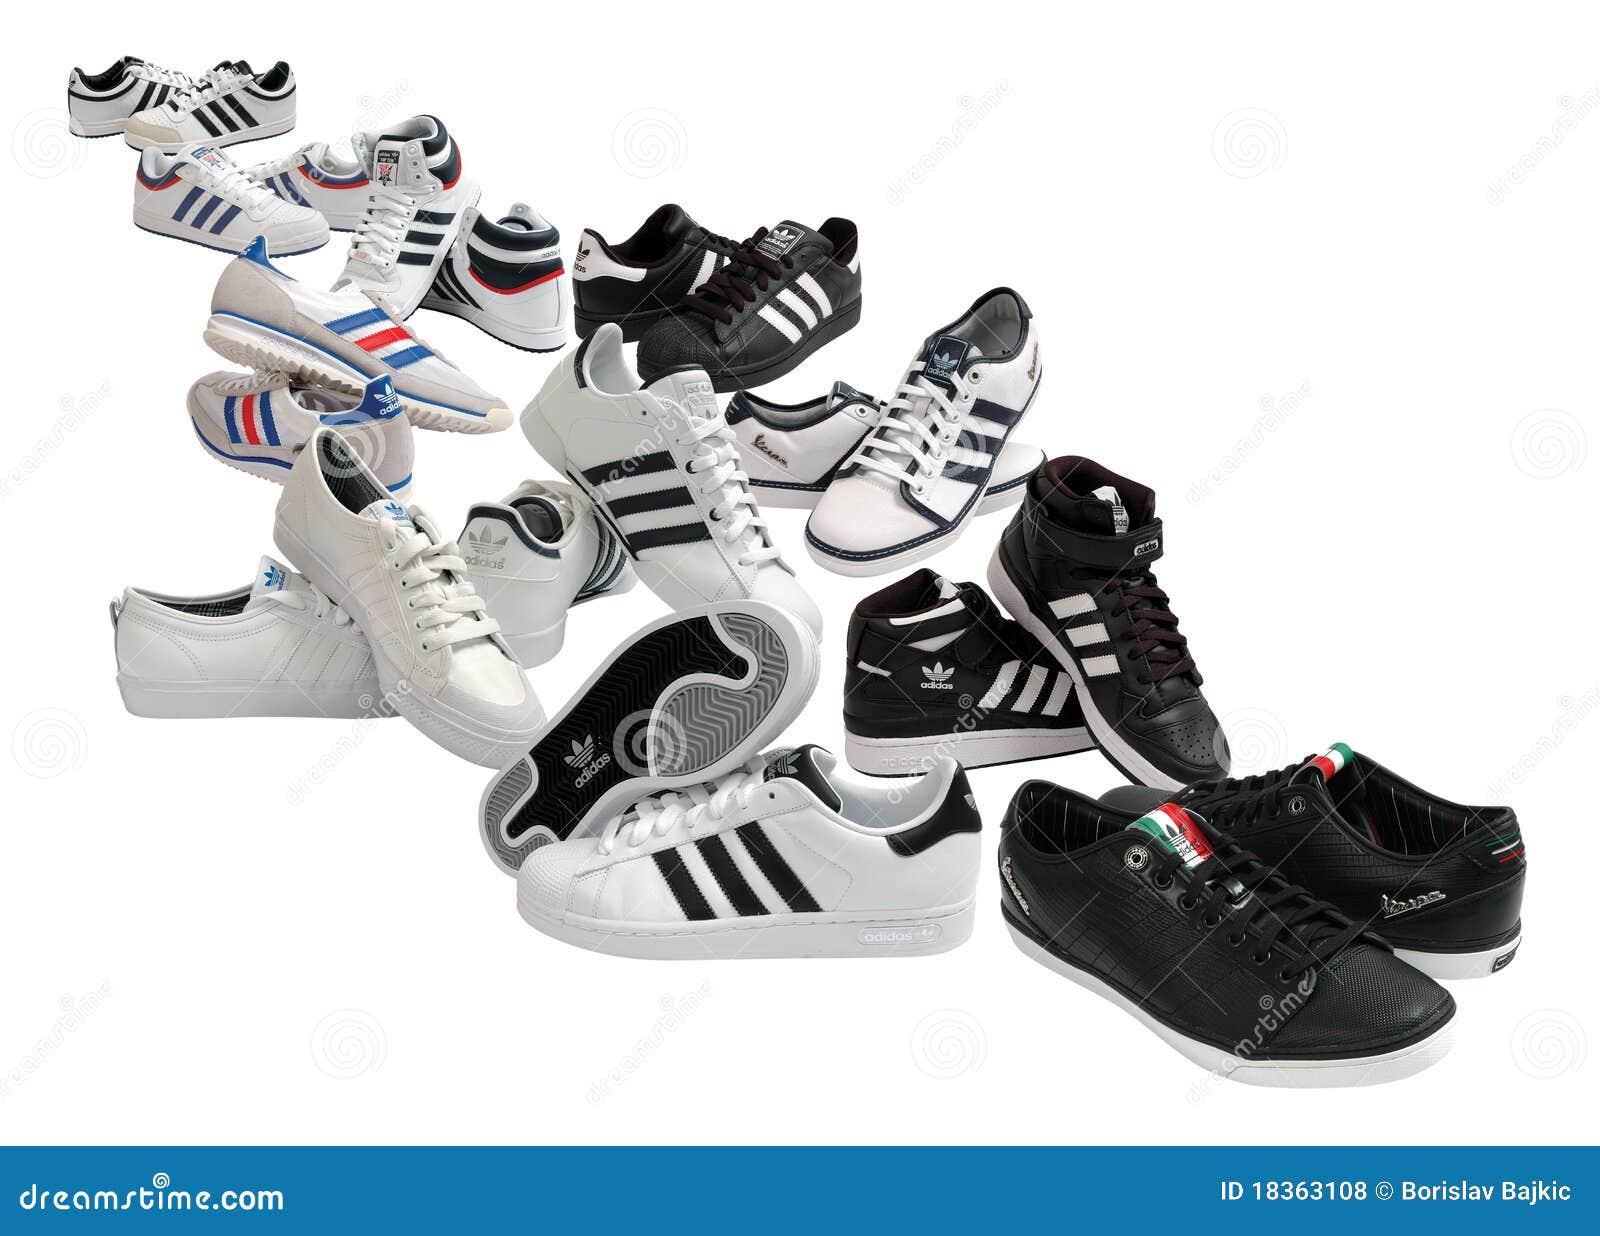 ba4dde18b9f παπούτσια adidas εκδοτική στοκ εικόνες. εικόνα από άσπρος - 18363108